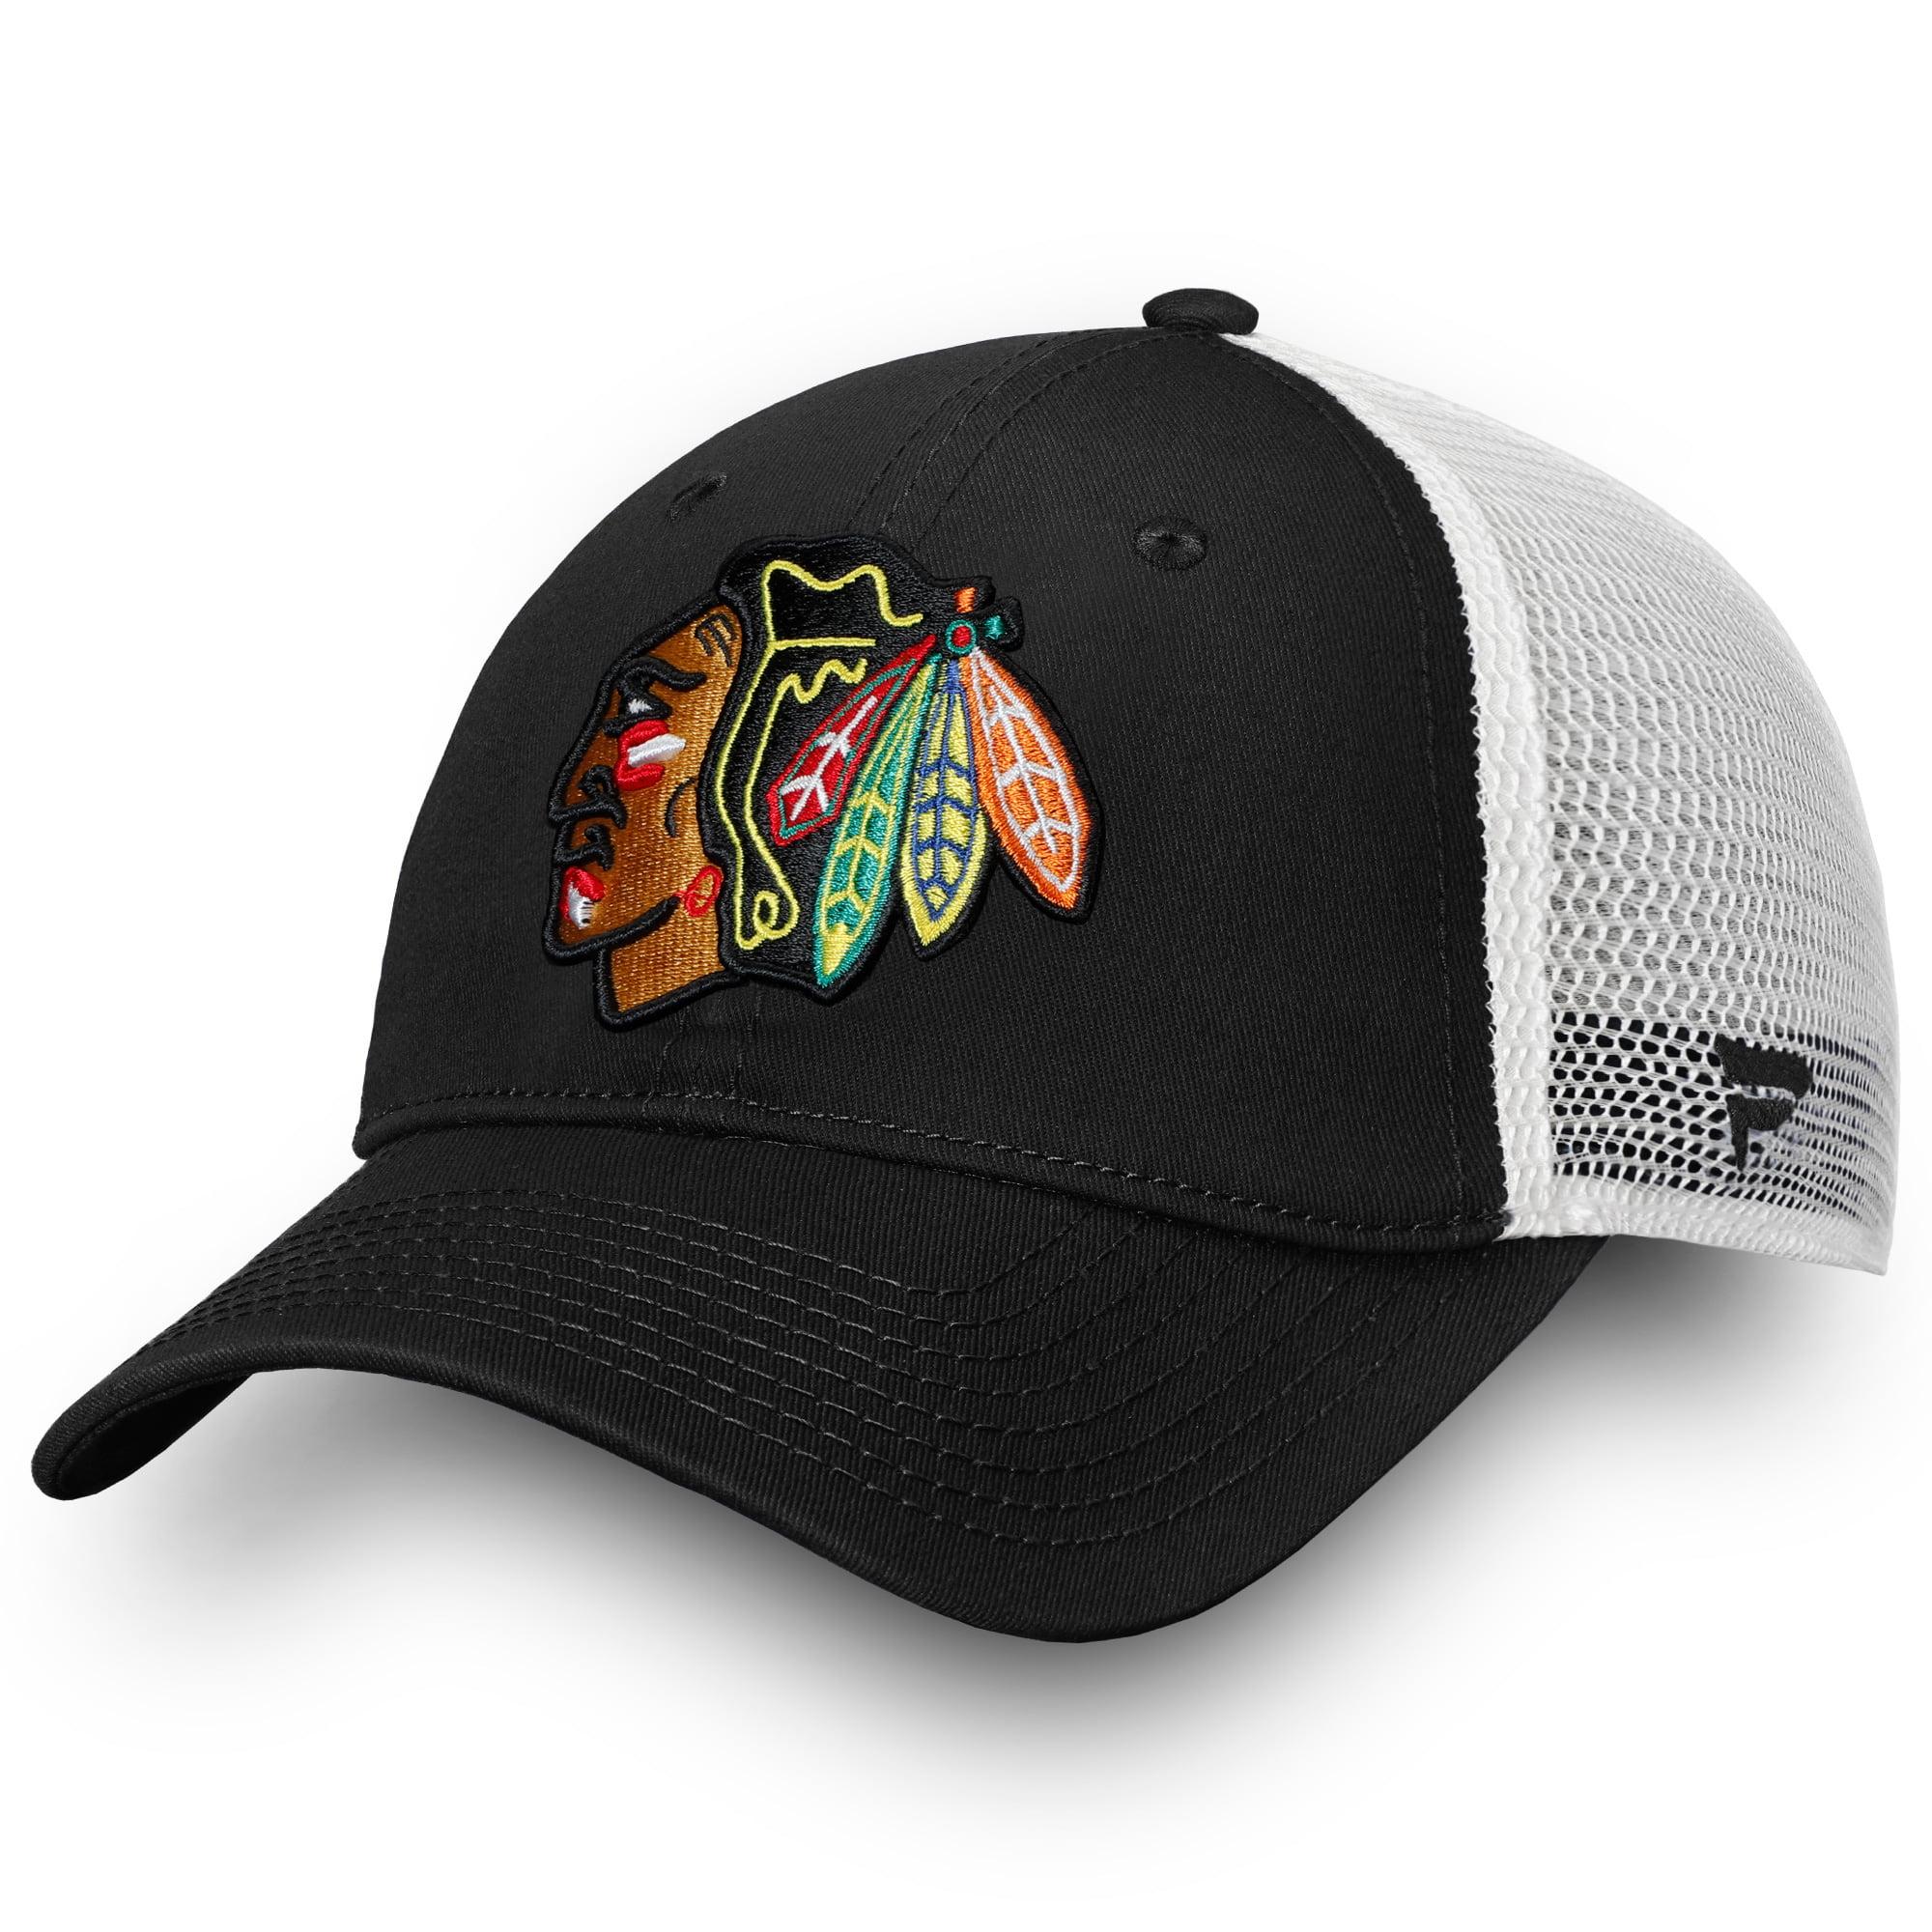 Chicago Blackhawks Fanatics Branded Core Trucker II Snapback Adjustable Hat - Black - OSFA